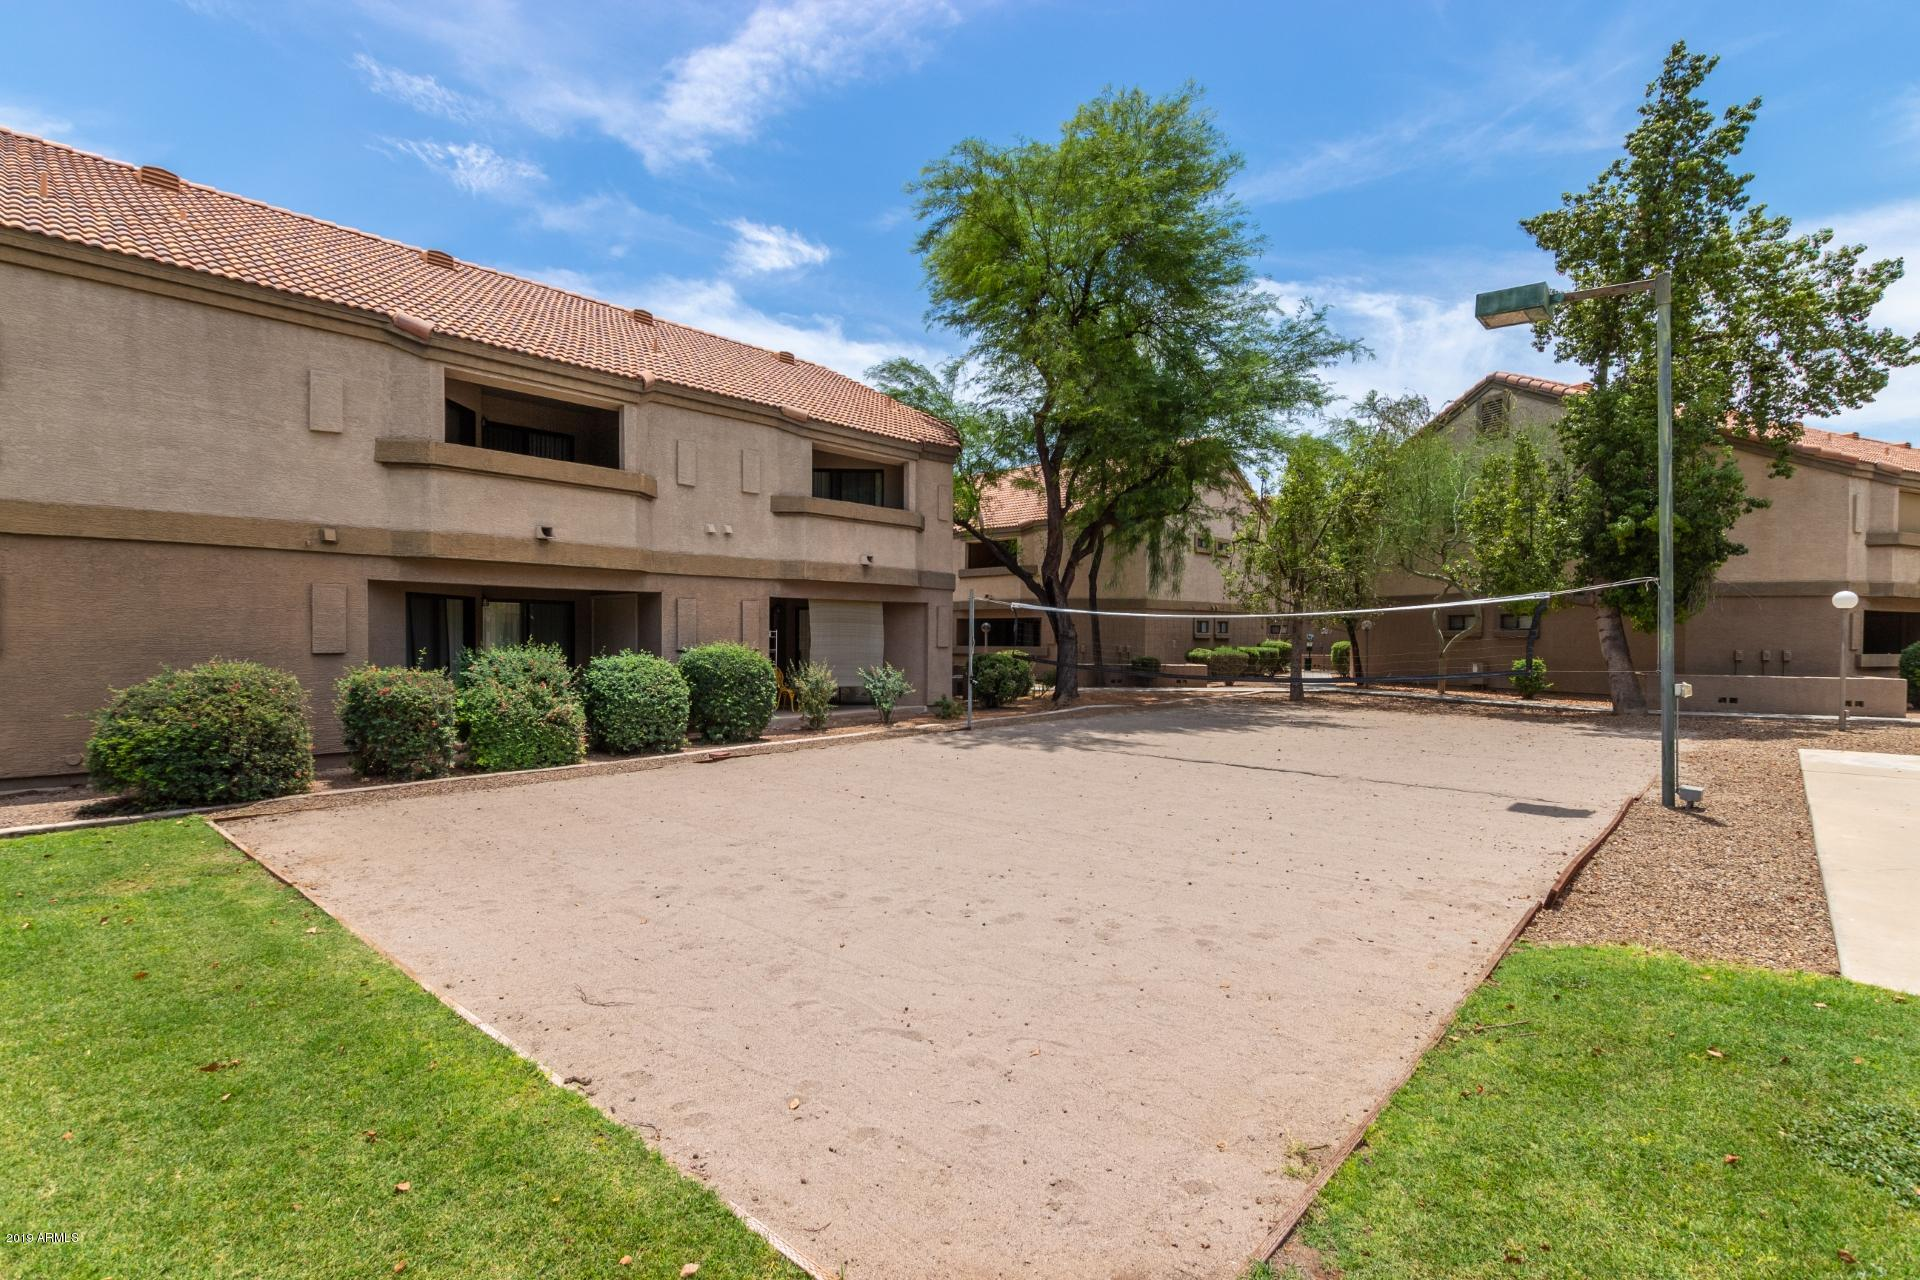 MLS 5937570 1287 N ALMA SCHOOL Road Unit 109, Chandler, AZ 85224 Chandler AZ Single-Story